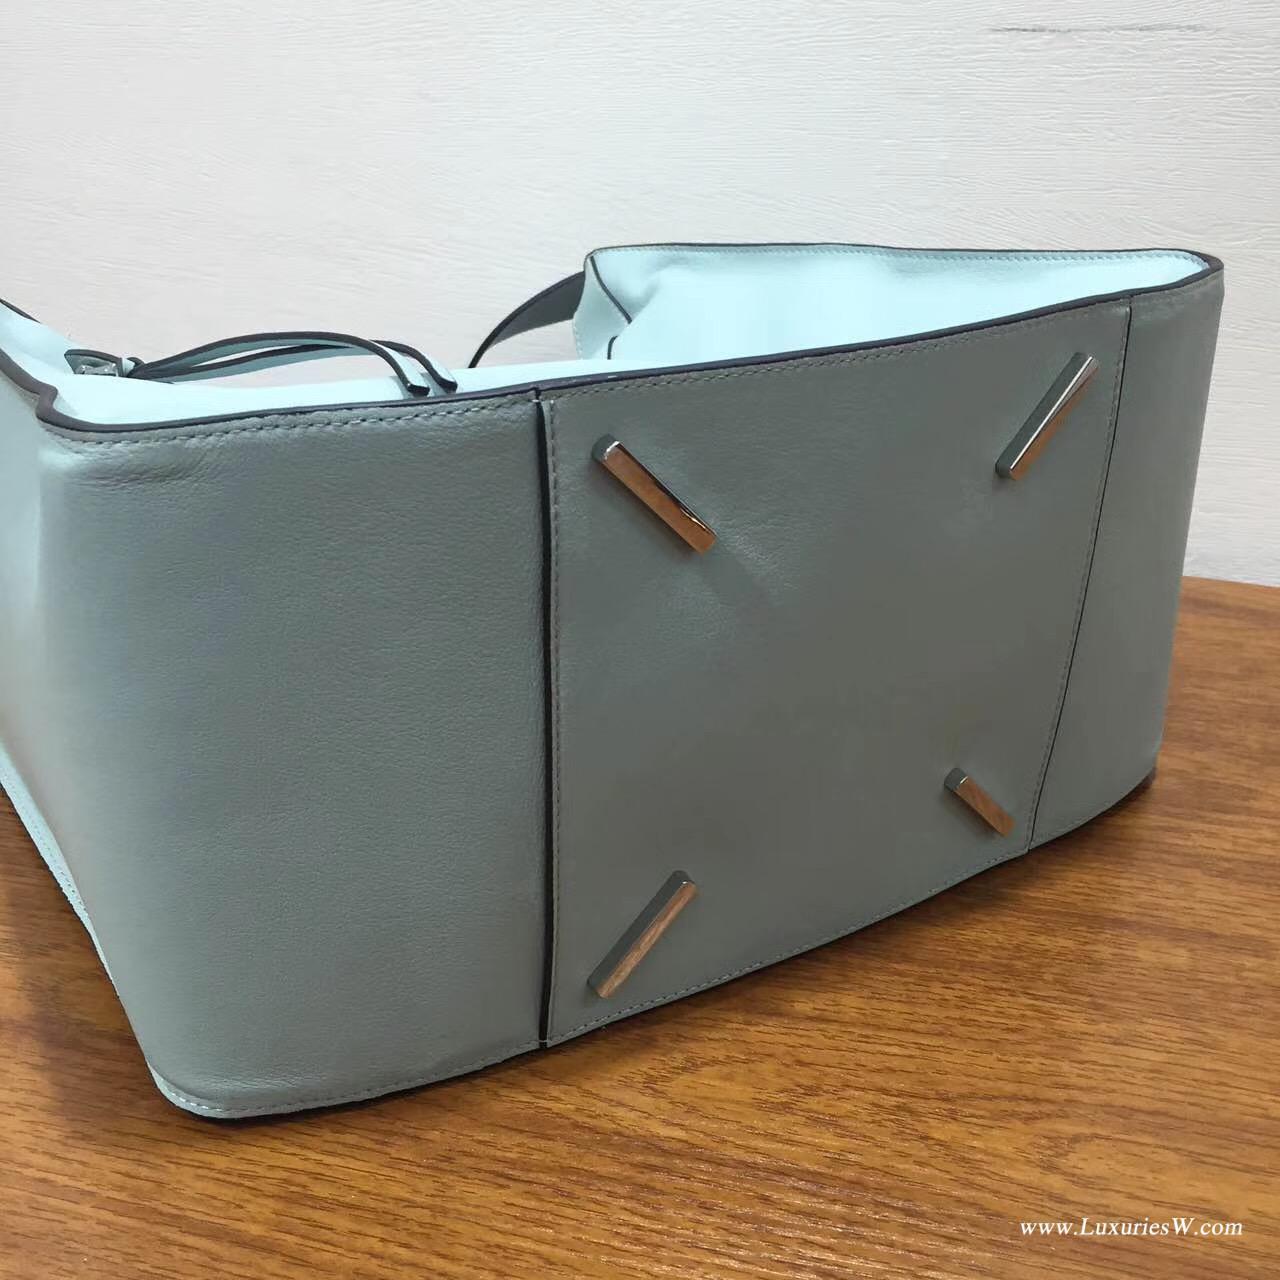 Loewe進口的柔軟小牛皮 hammock bag 大號冰藍(水綠色)